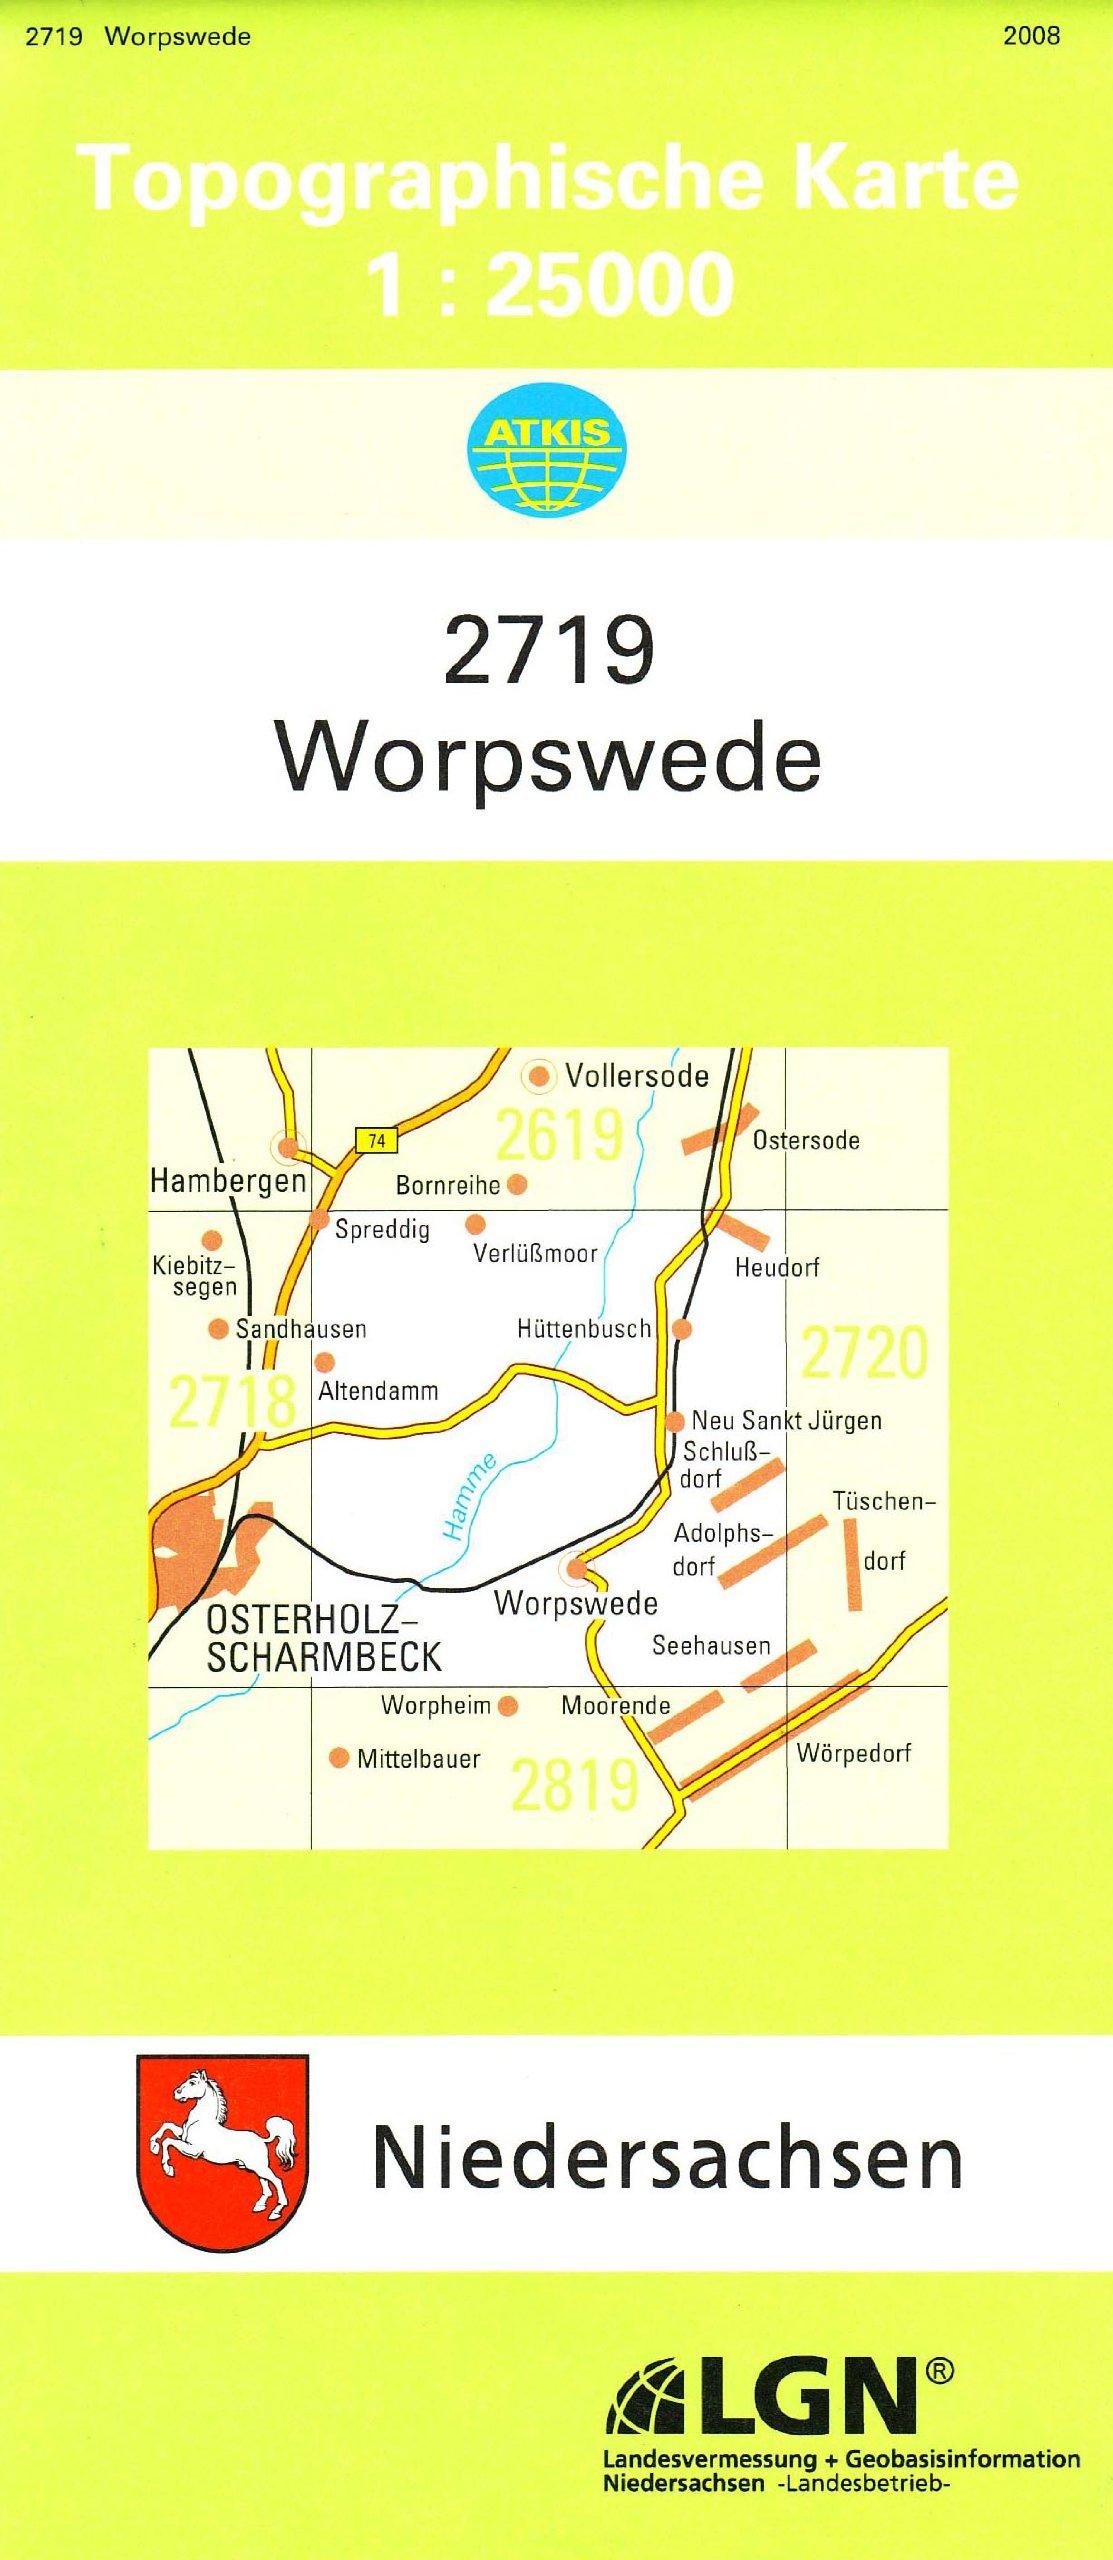 Worpswede (N) Landkarte – 1. Dezember 2015 3894351144 Karten Stadtpläne Deutschland